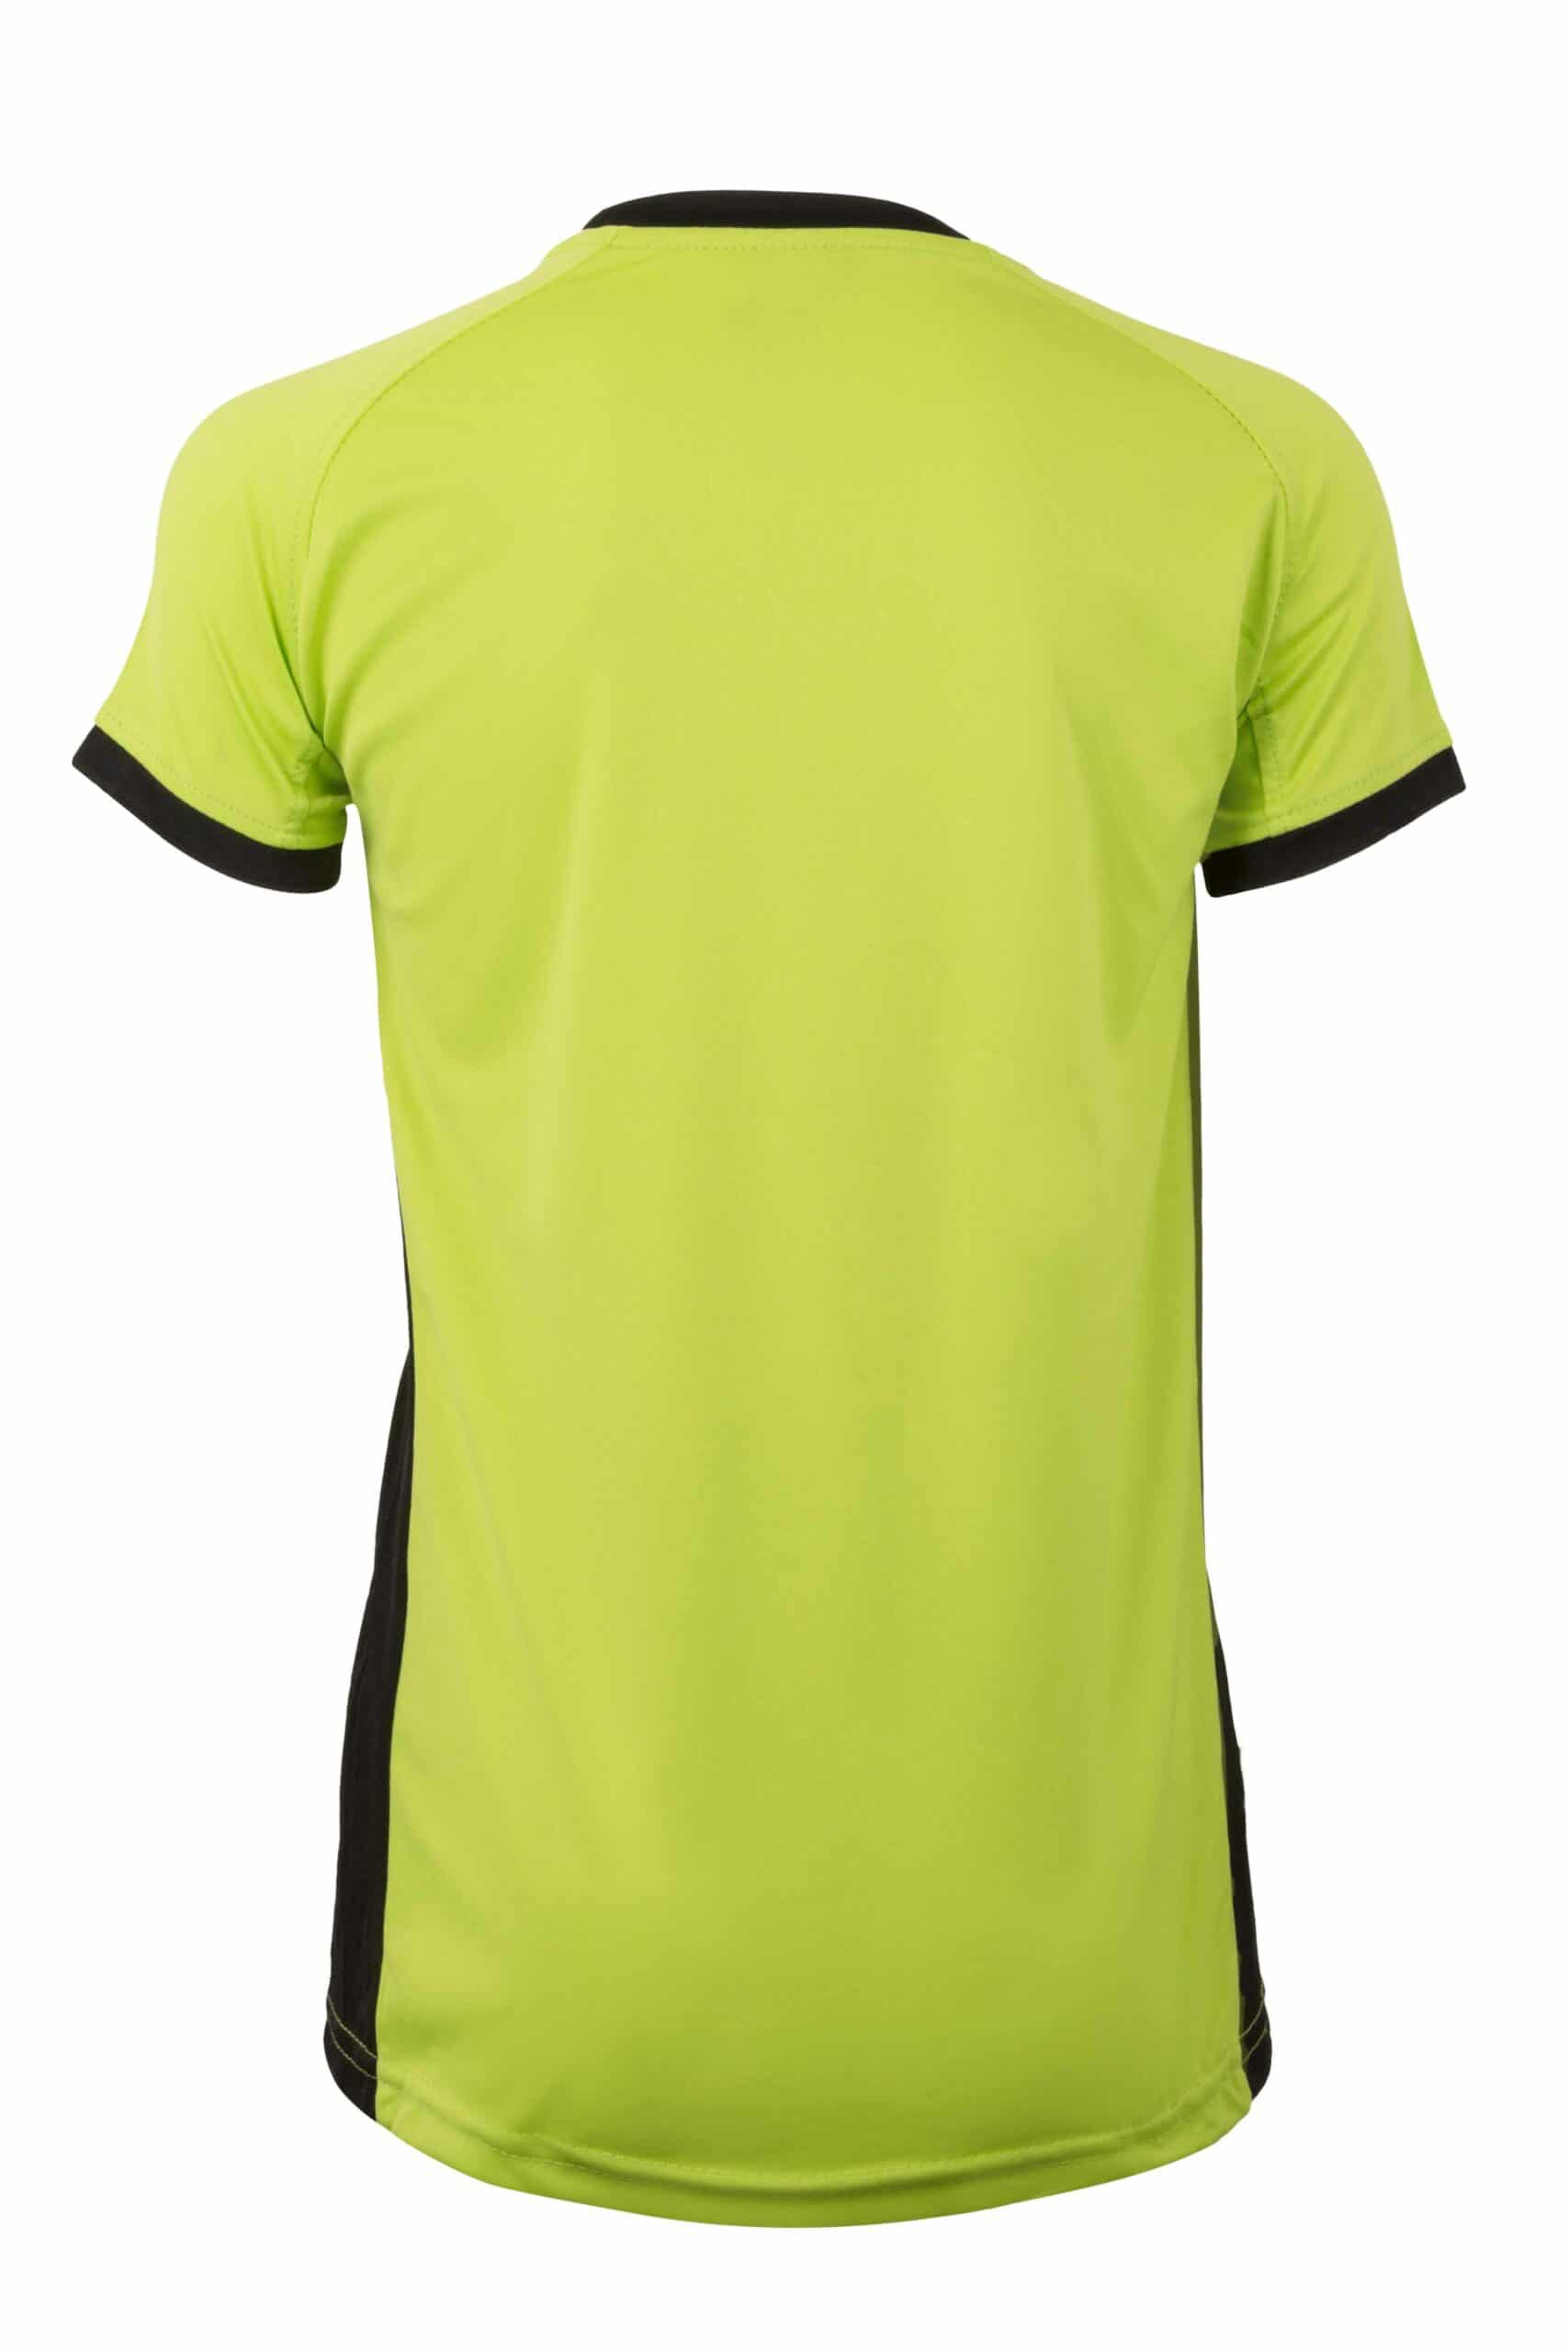 Mukua Mk531v Camiseta TÉcnica Manga Corta Bicolor NiÑo FlÚor Yellow Black 2